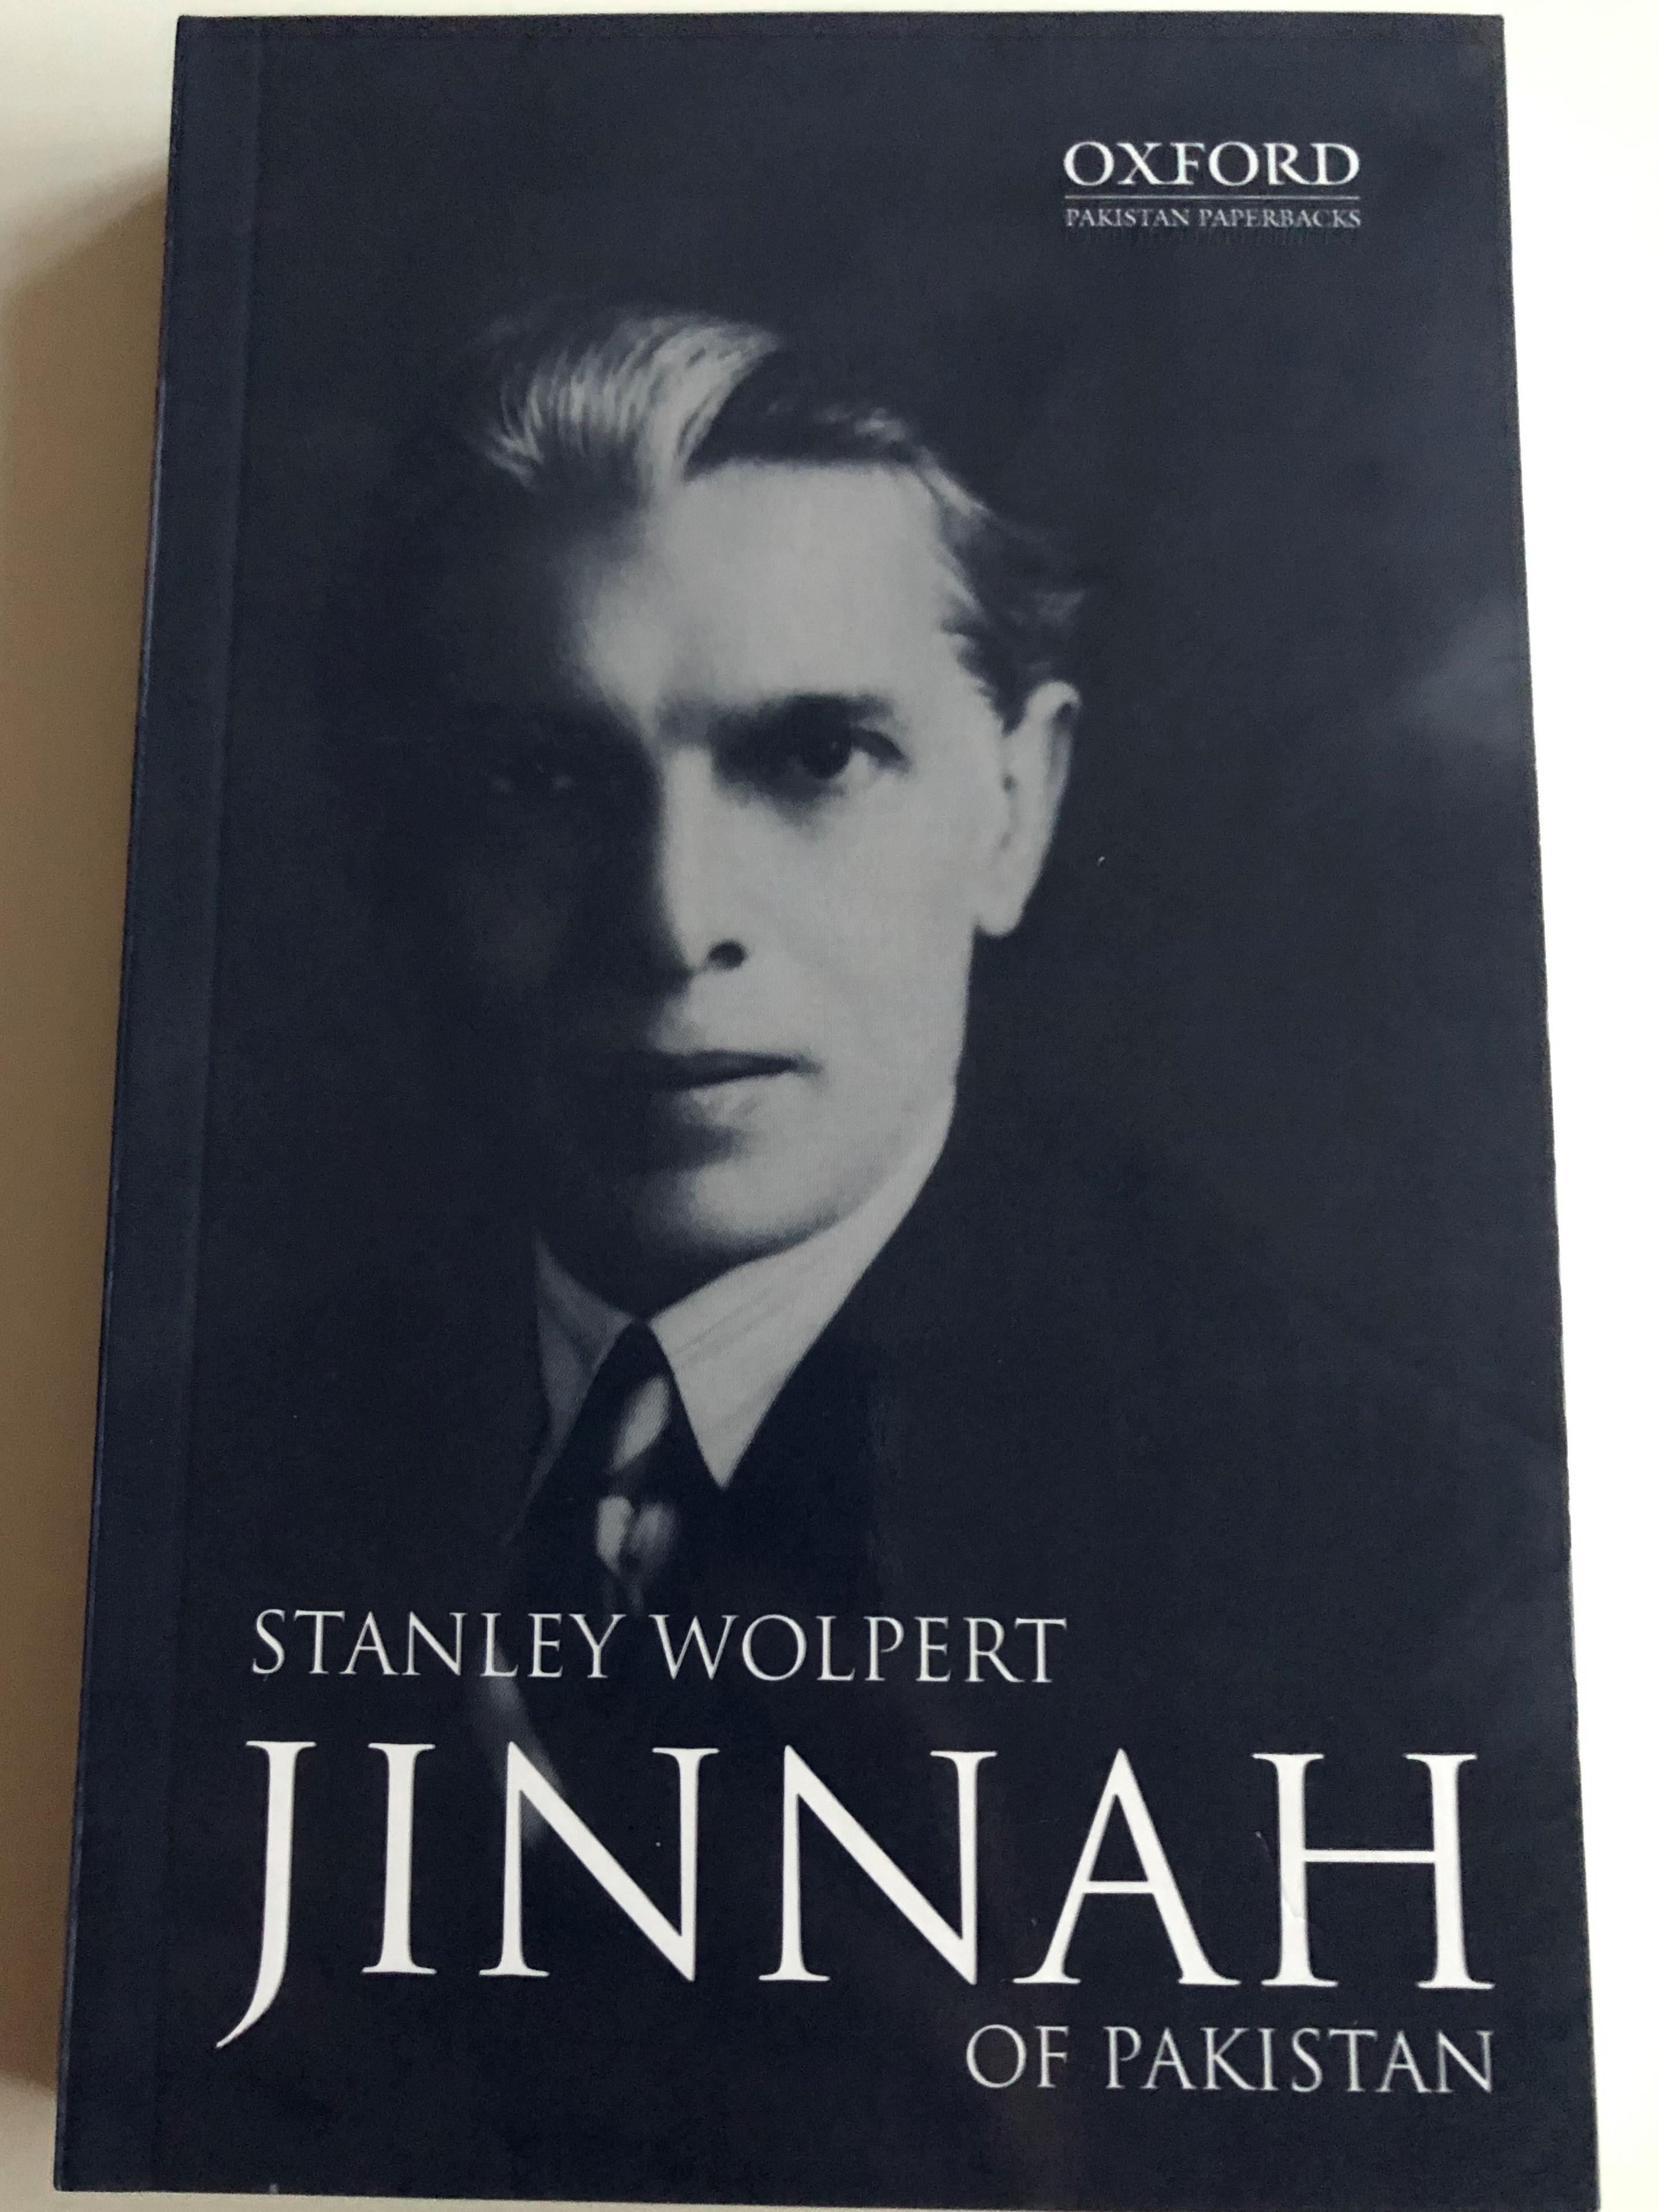 jinnah-of-pakistan-by-stanley-wolpert-oxford-pakistan-paperbacks-1-.jpg